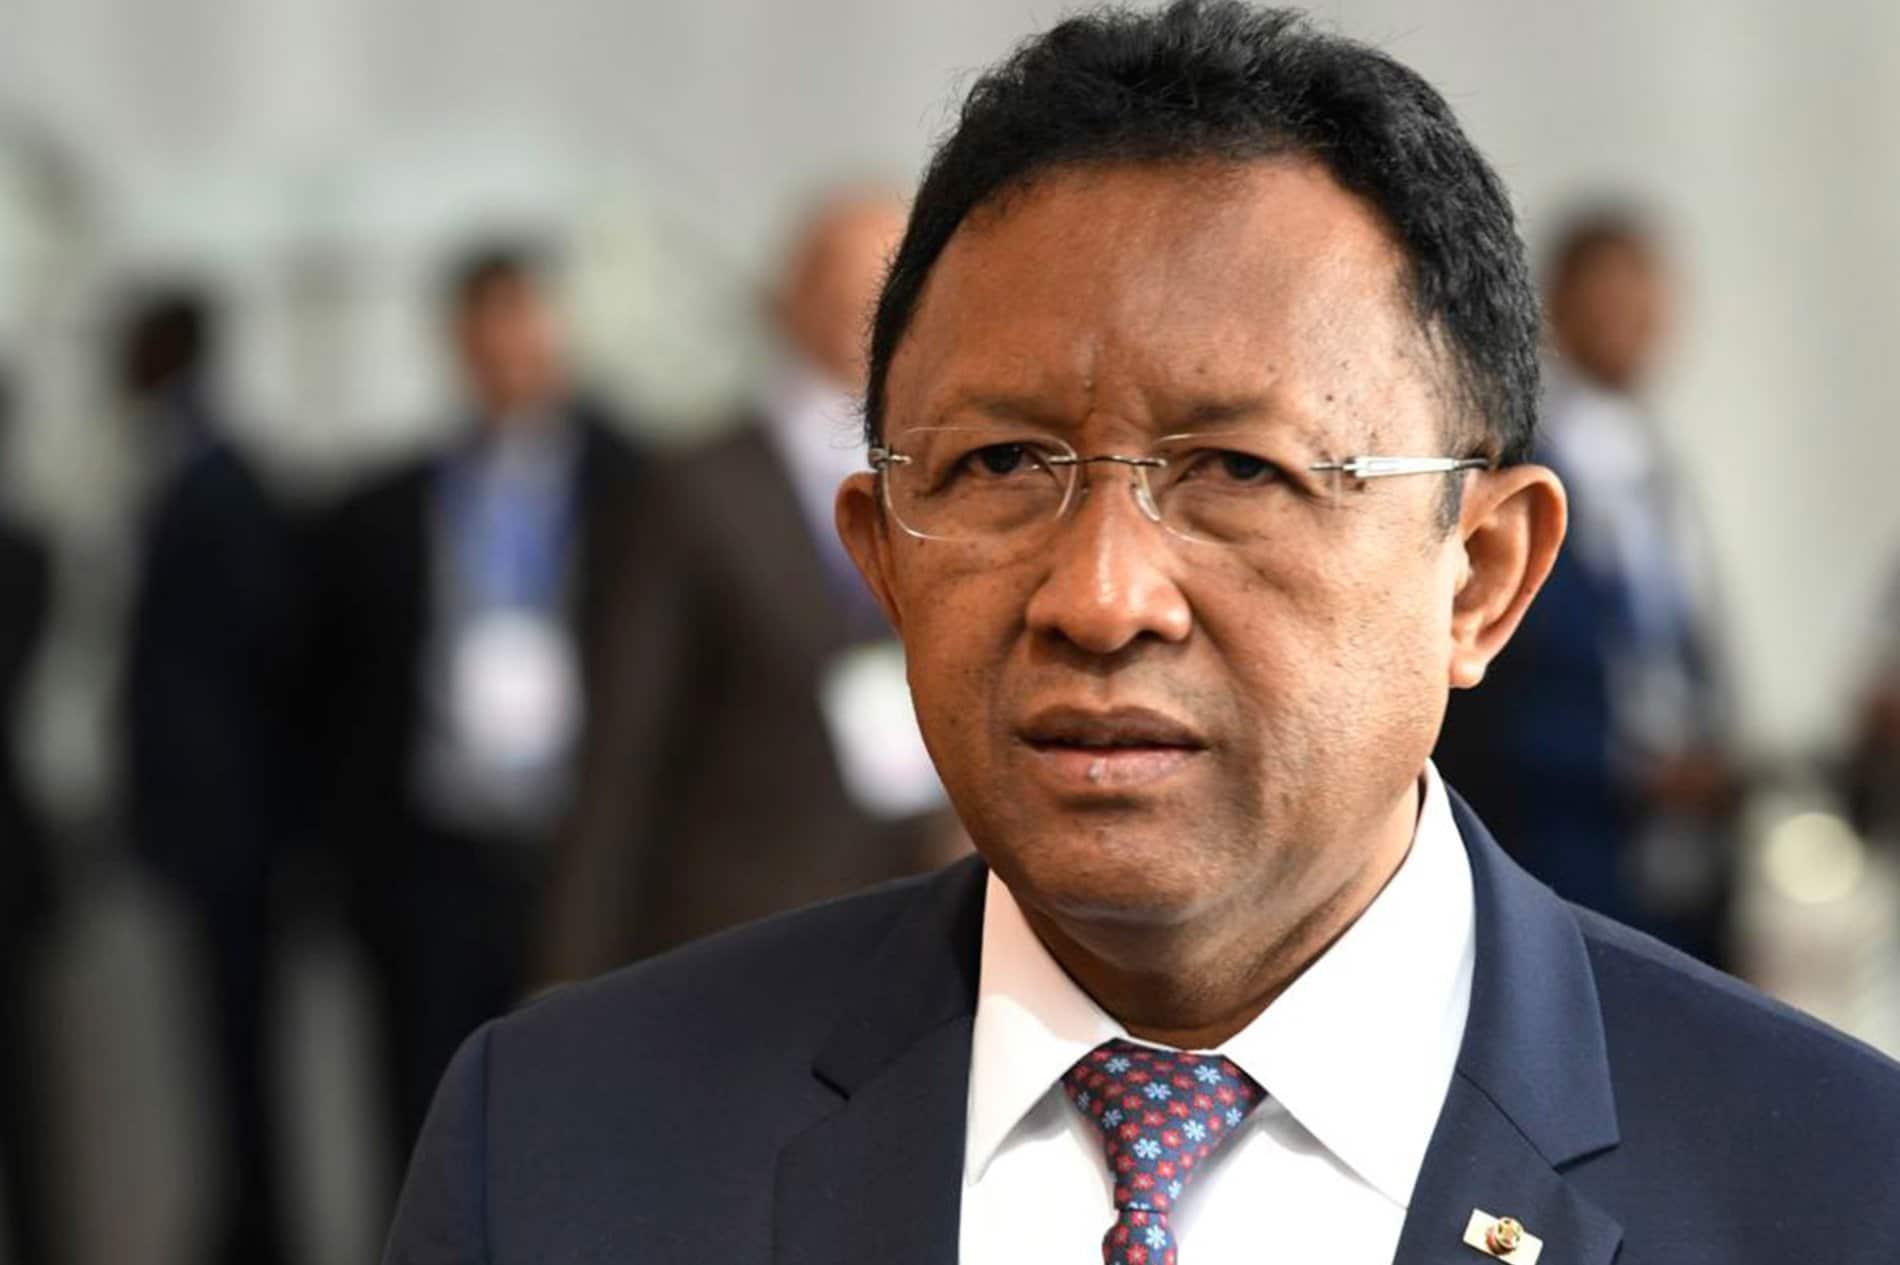 ACCUEIL-Le président Hery Rajaonarimampianina a reçu Lakhdar Brahimi